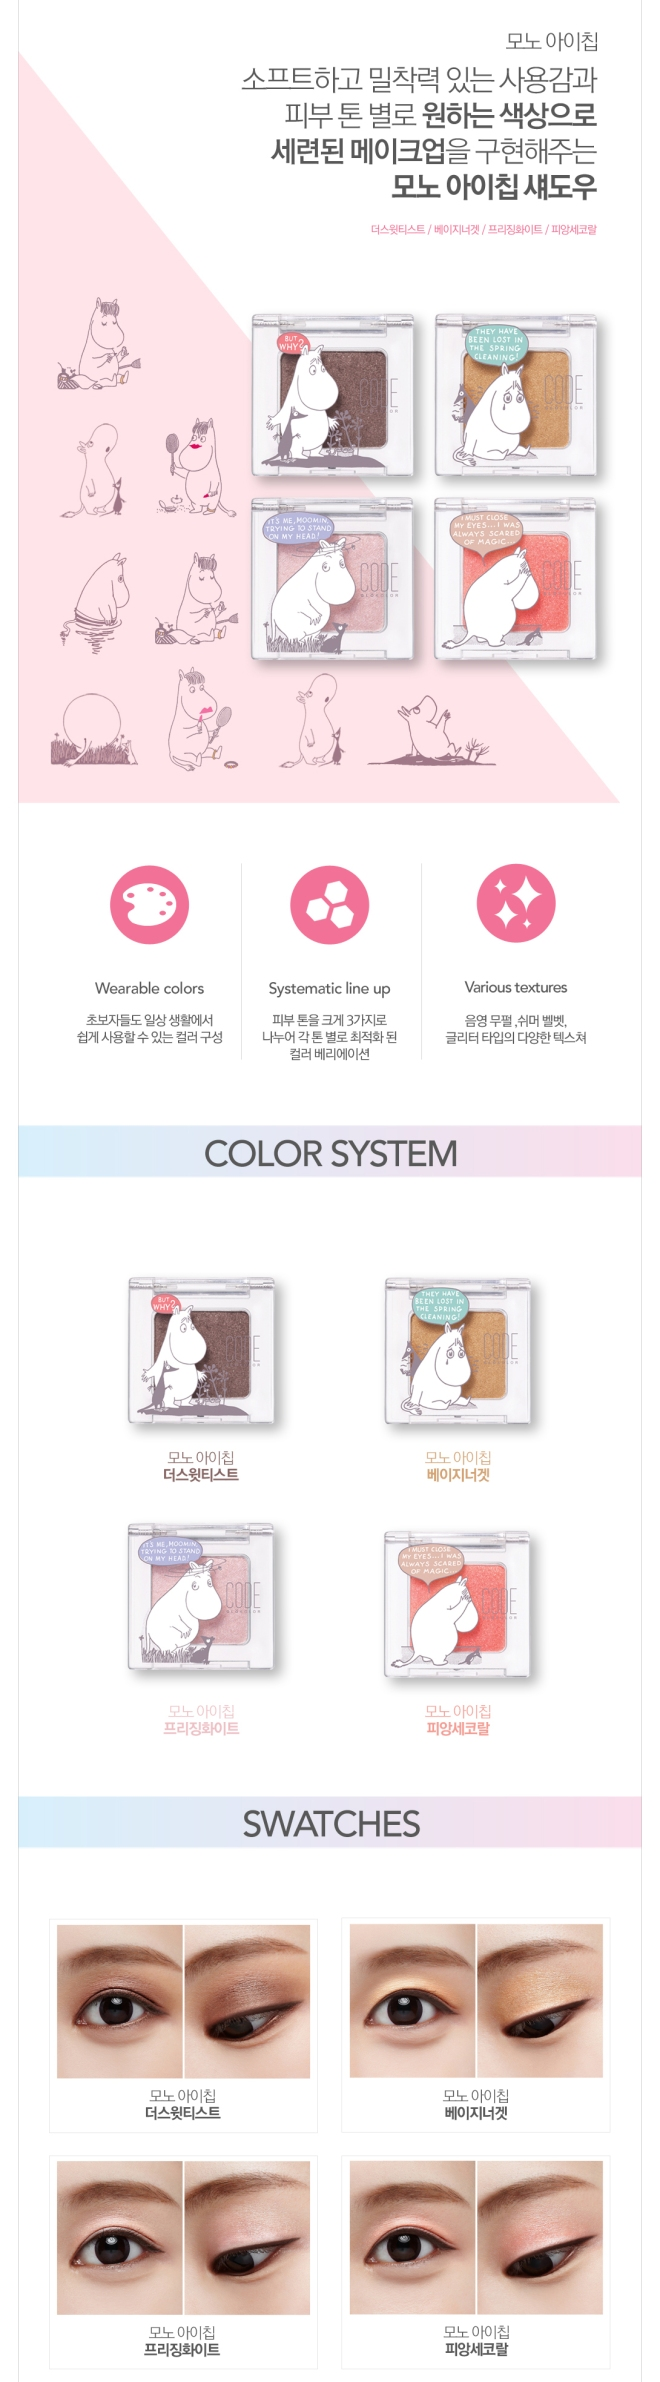 Code Glokolor x Moomin - Mono Eyeshadows